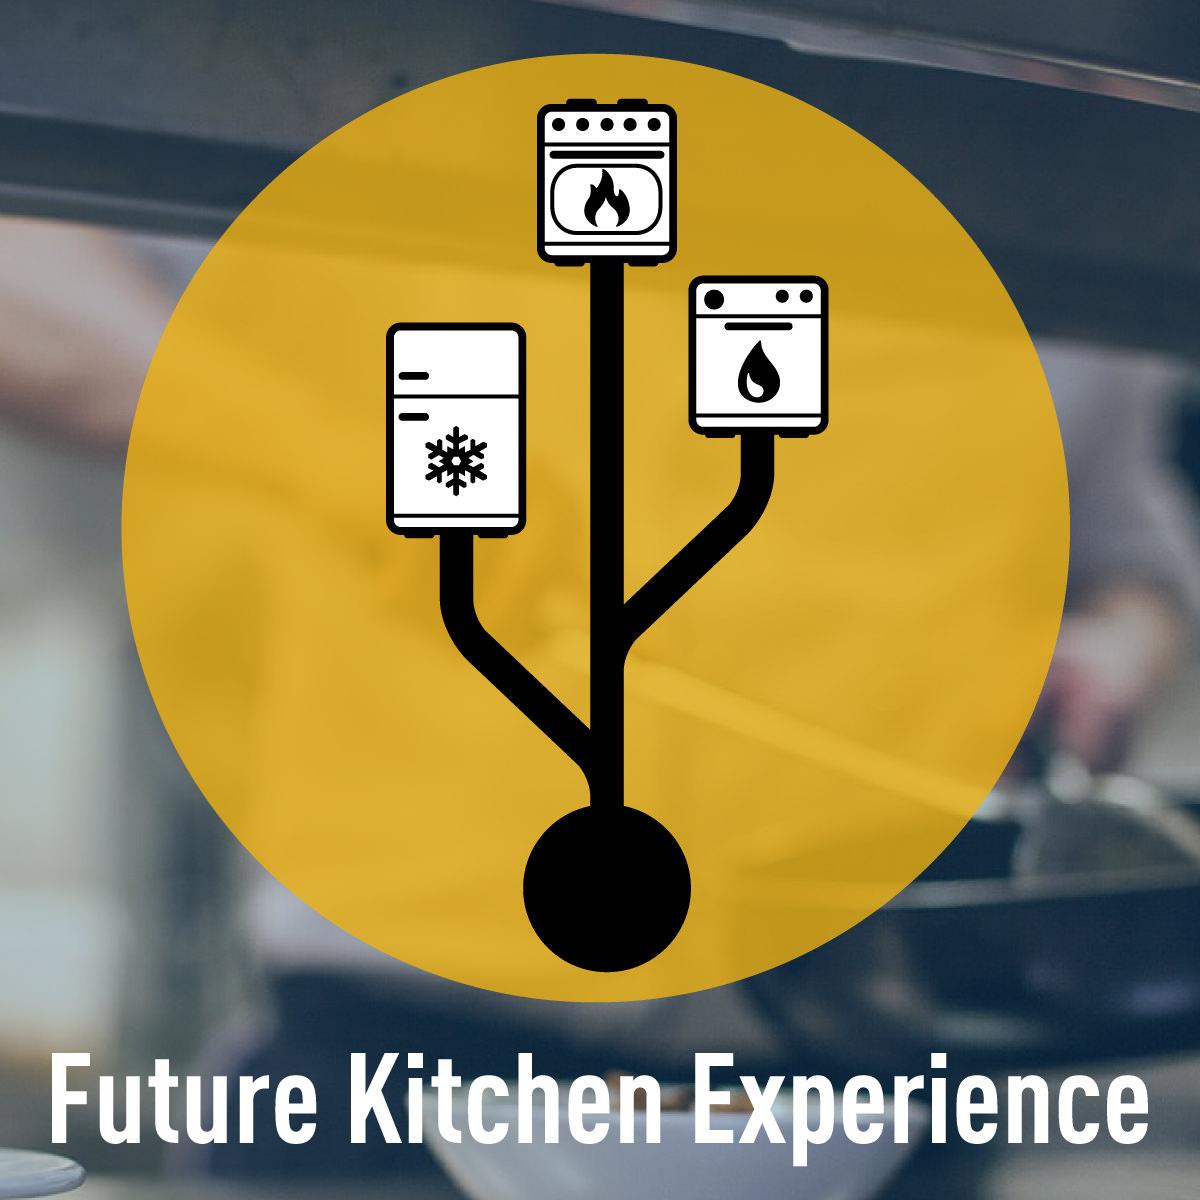 Future-Kitchen-Experience_image-size-promo_1200x1200